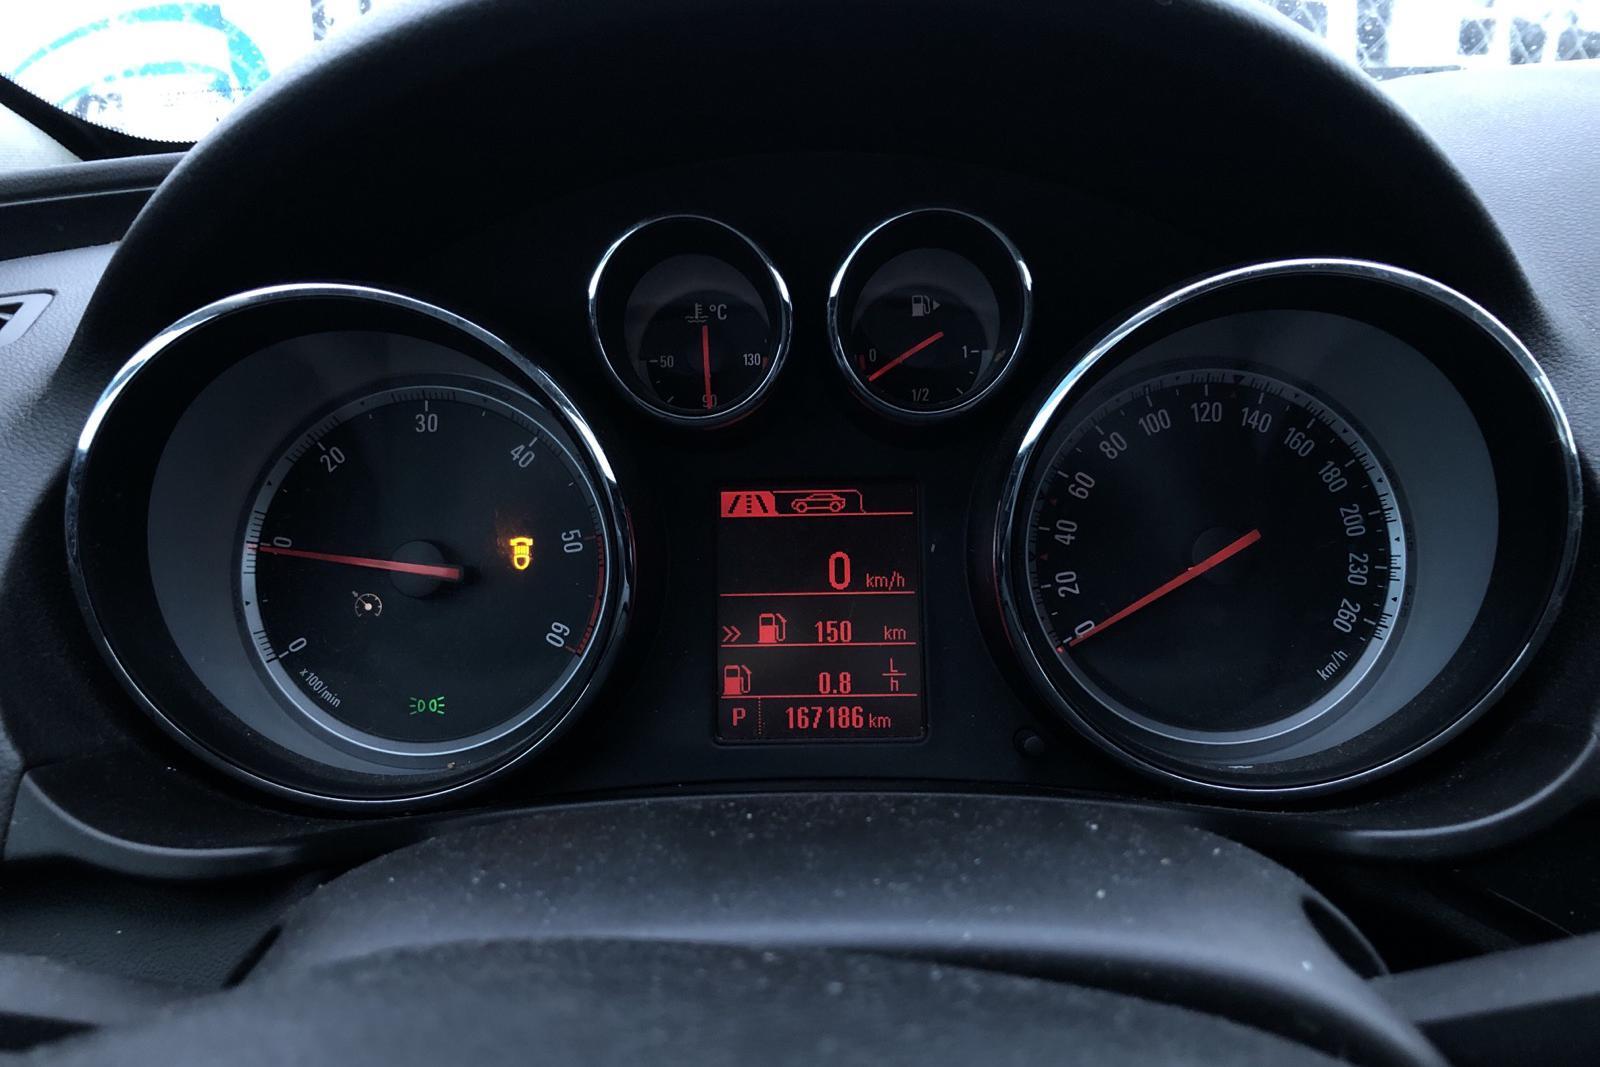 Opel Insignia 2.0 CDTI 4x4 5dr (160hk) - 167 180 km - Automatic - black - 2012